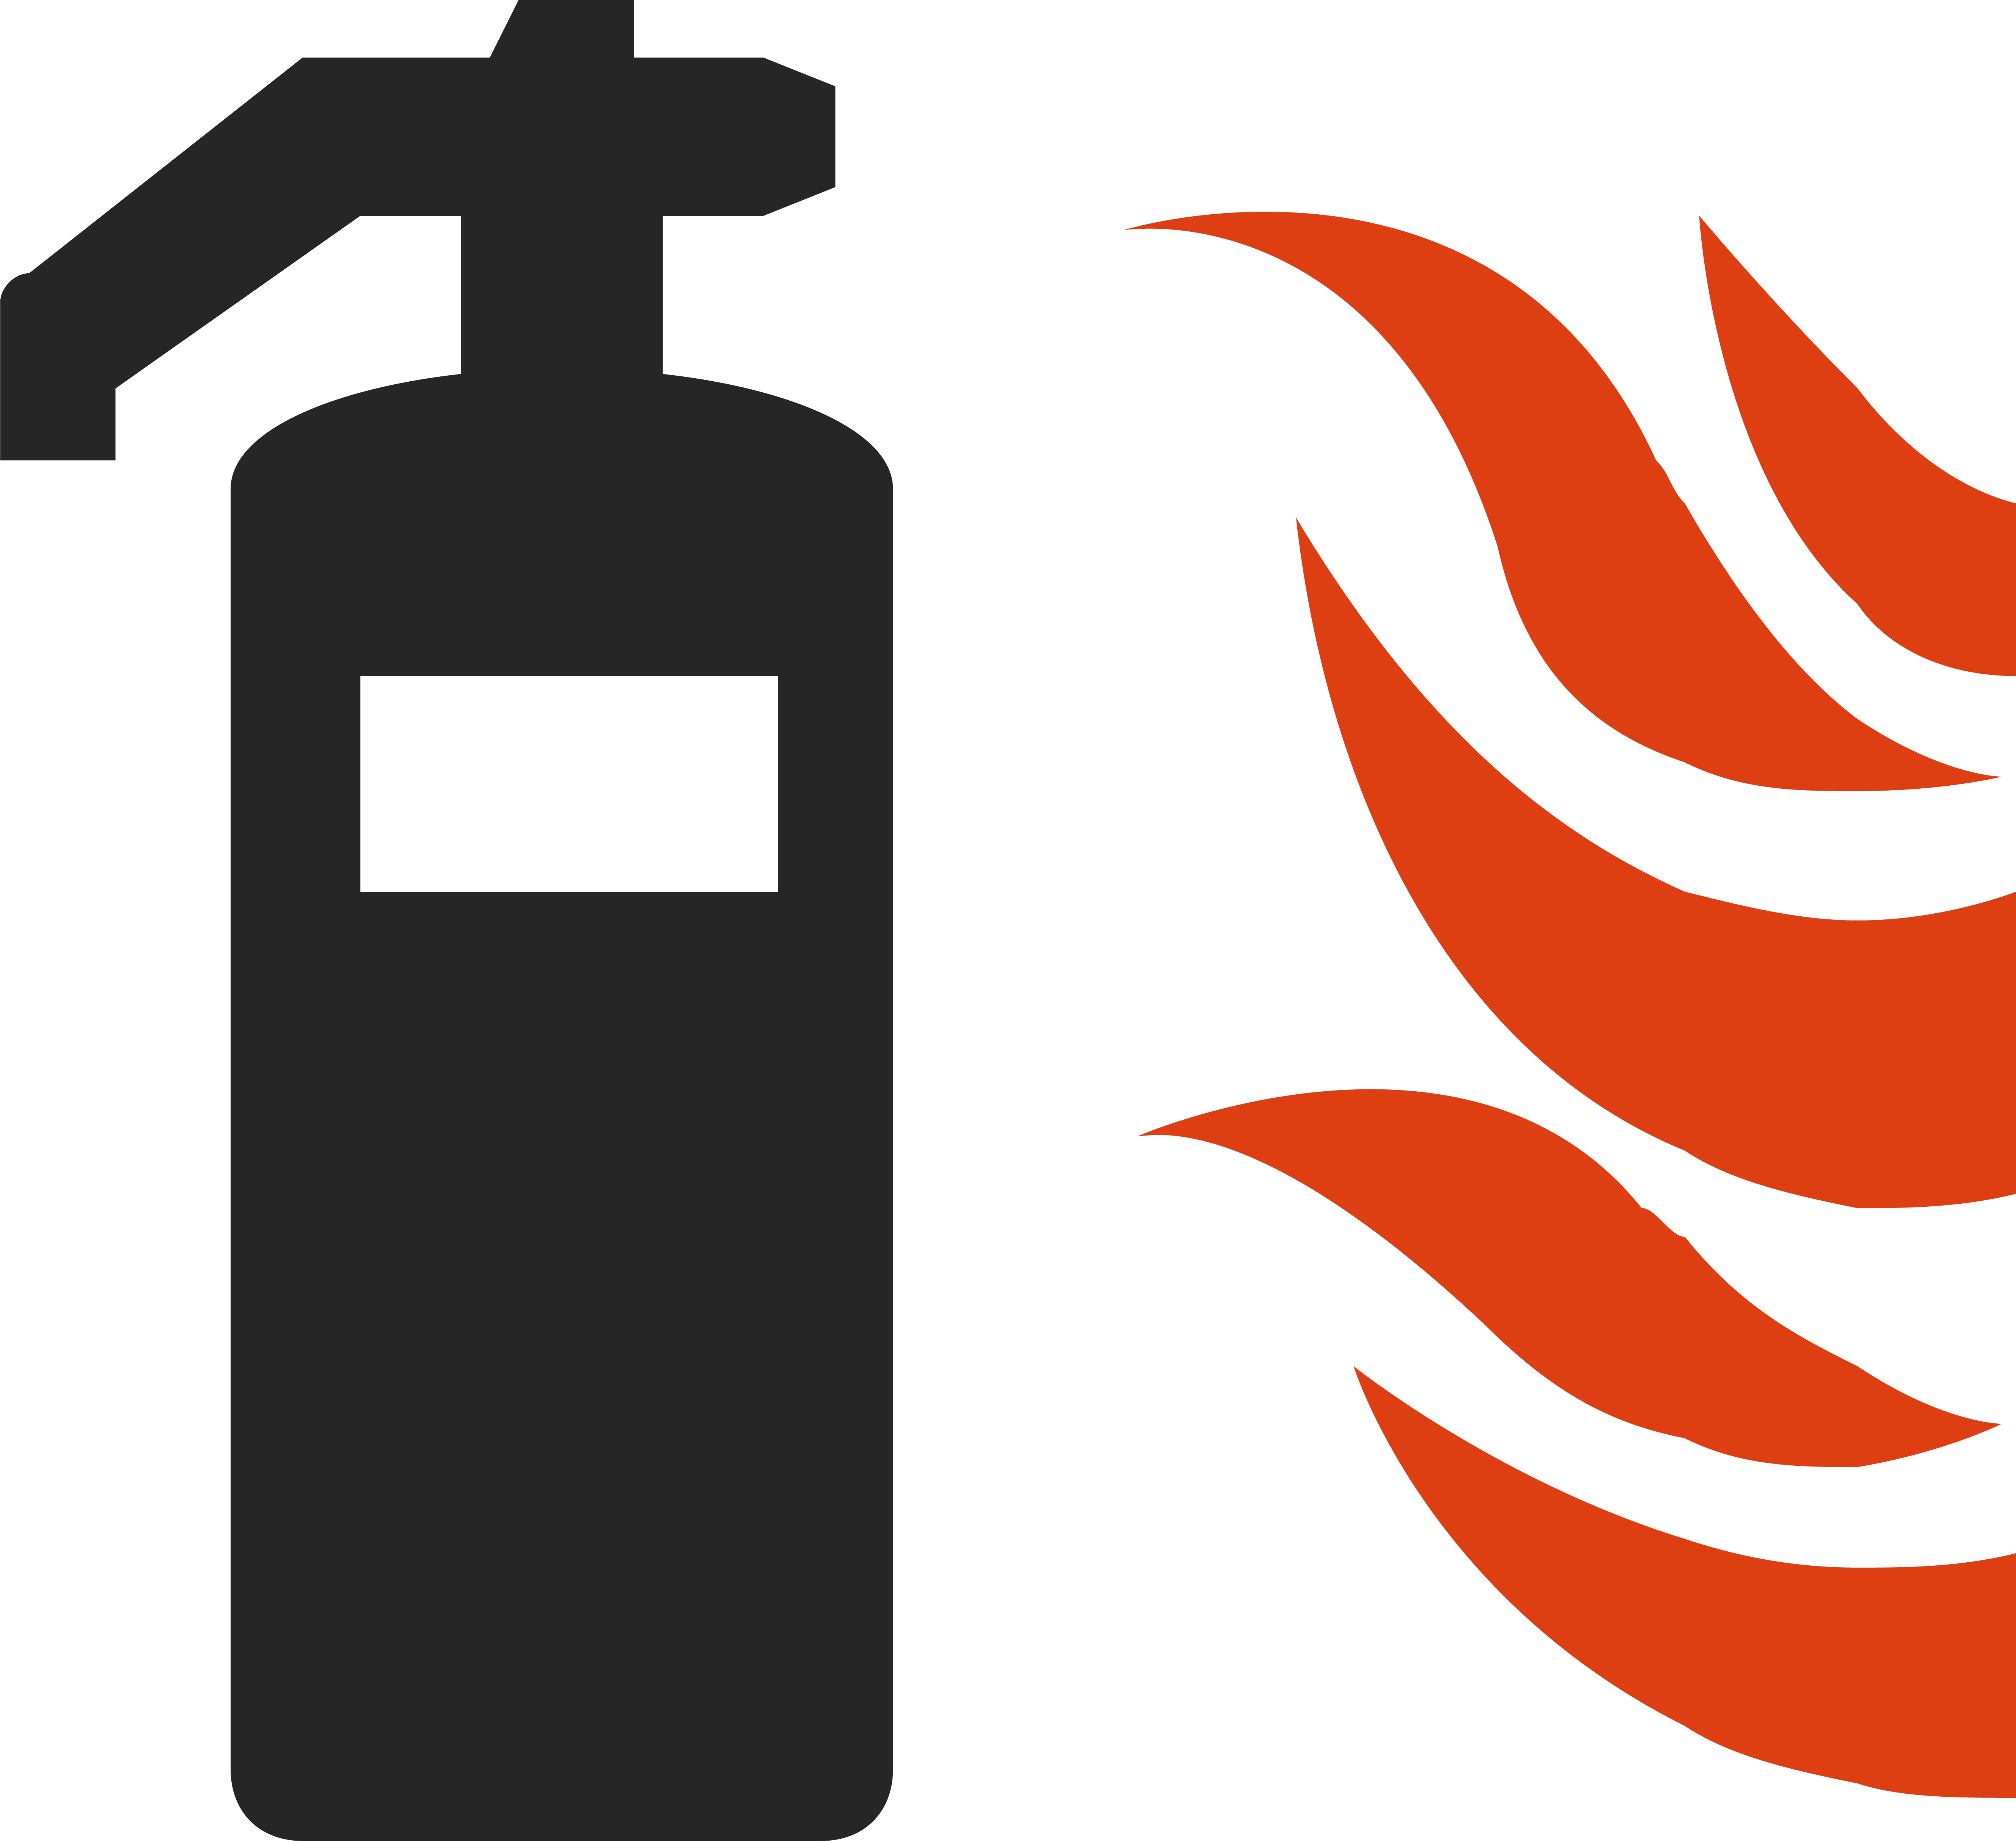 Fire extinguisher symbol logo. Facebook clipart business card